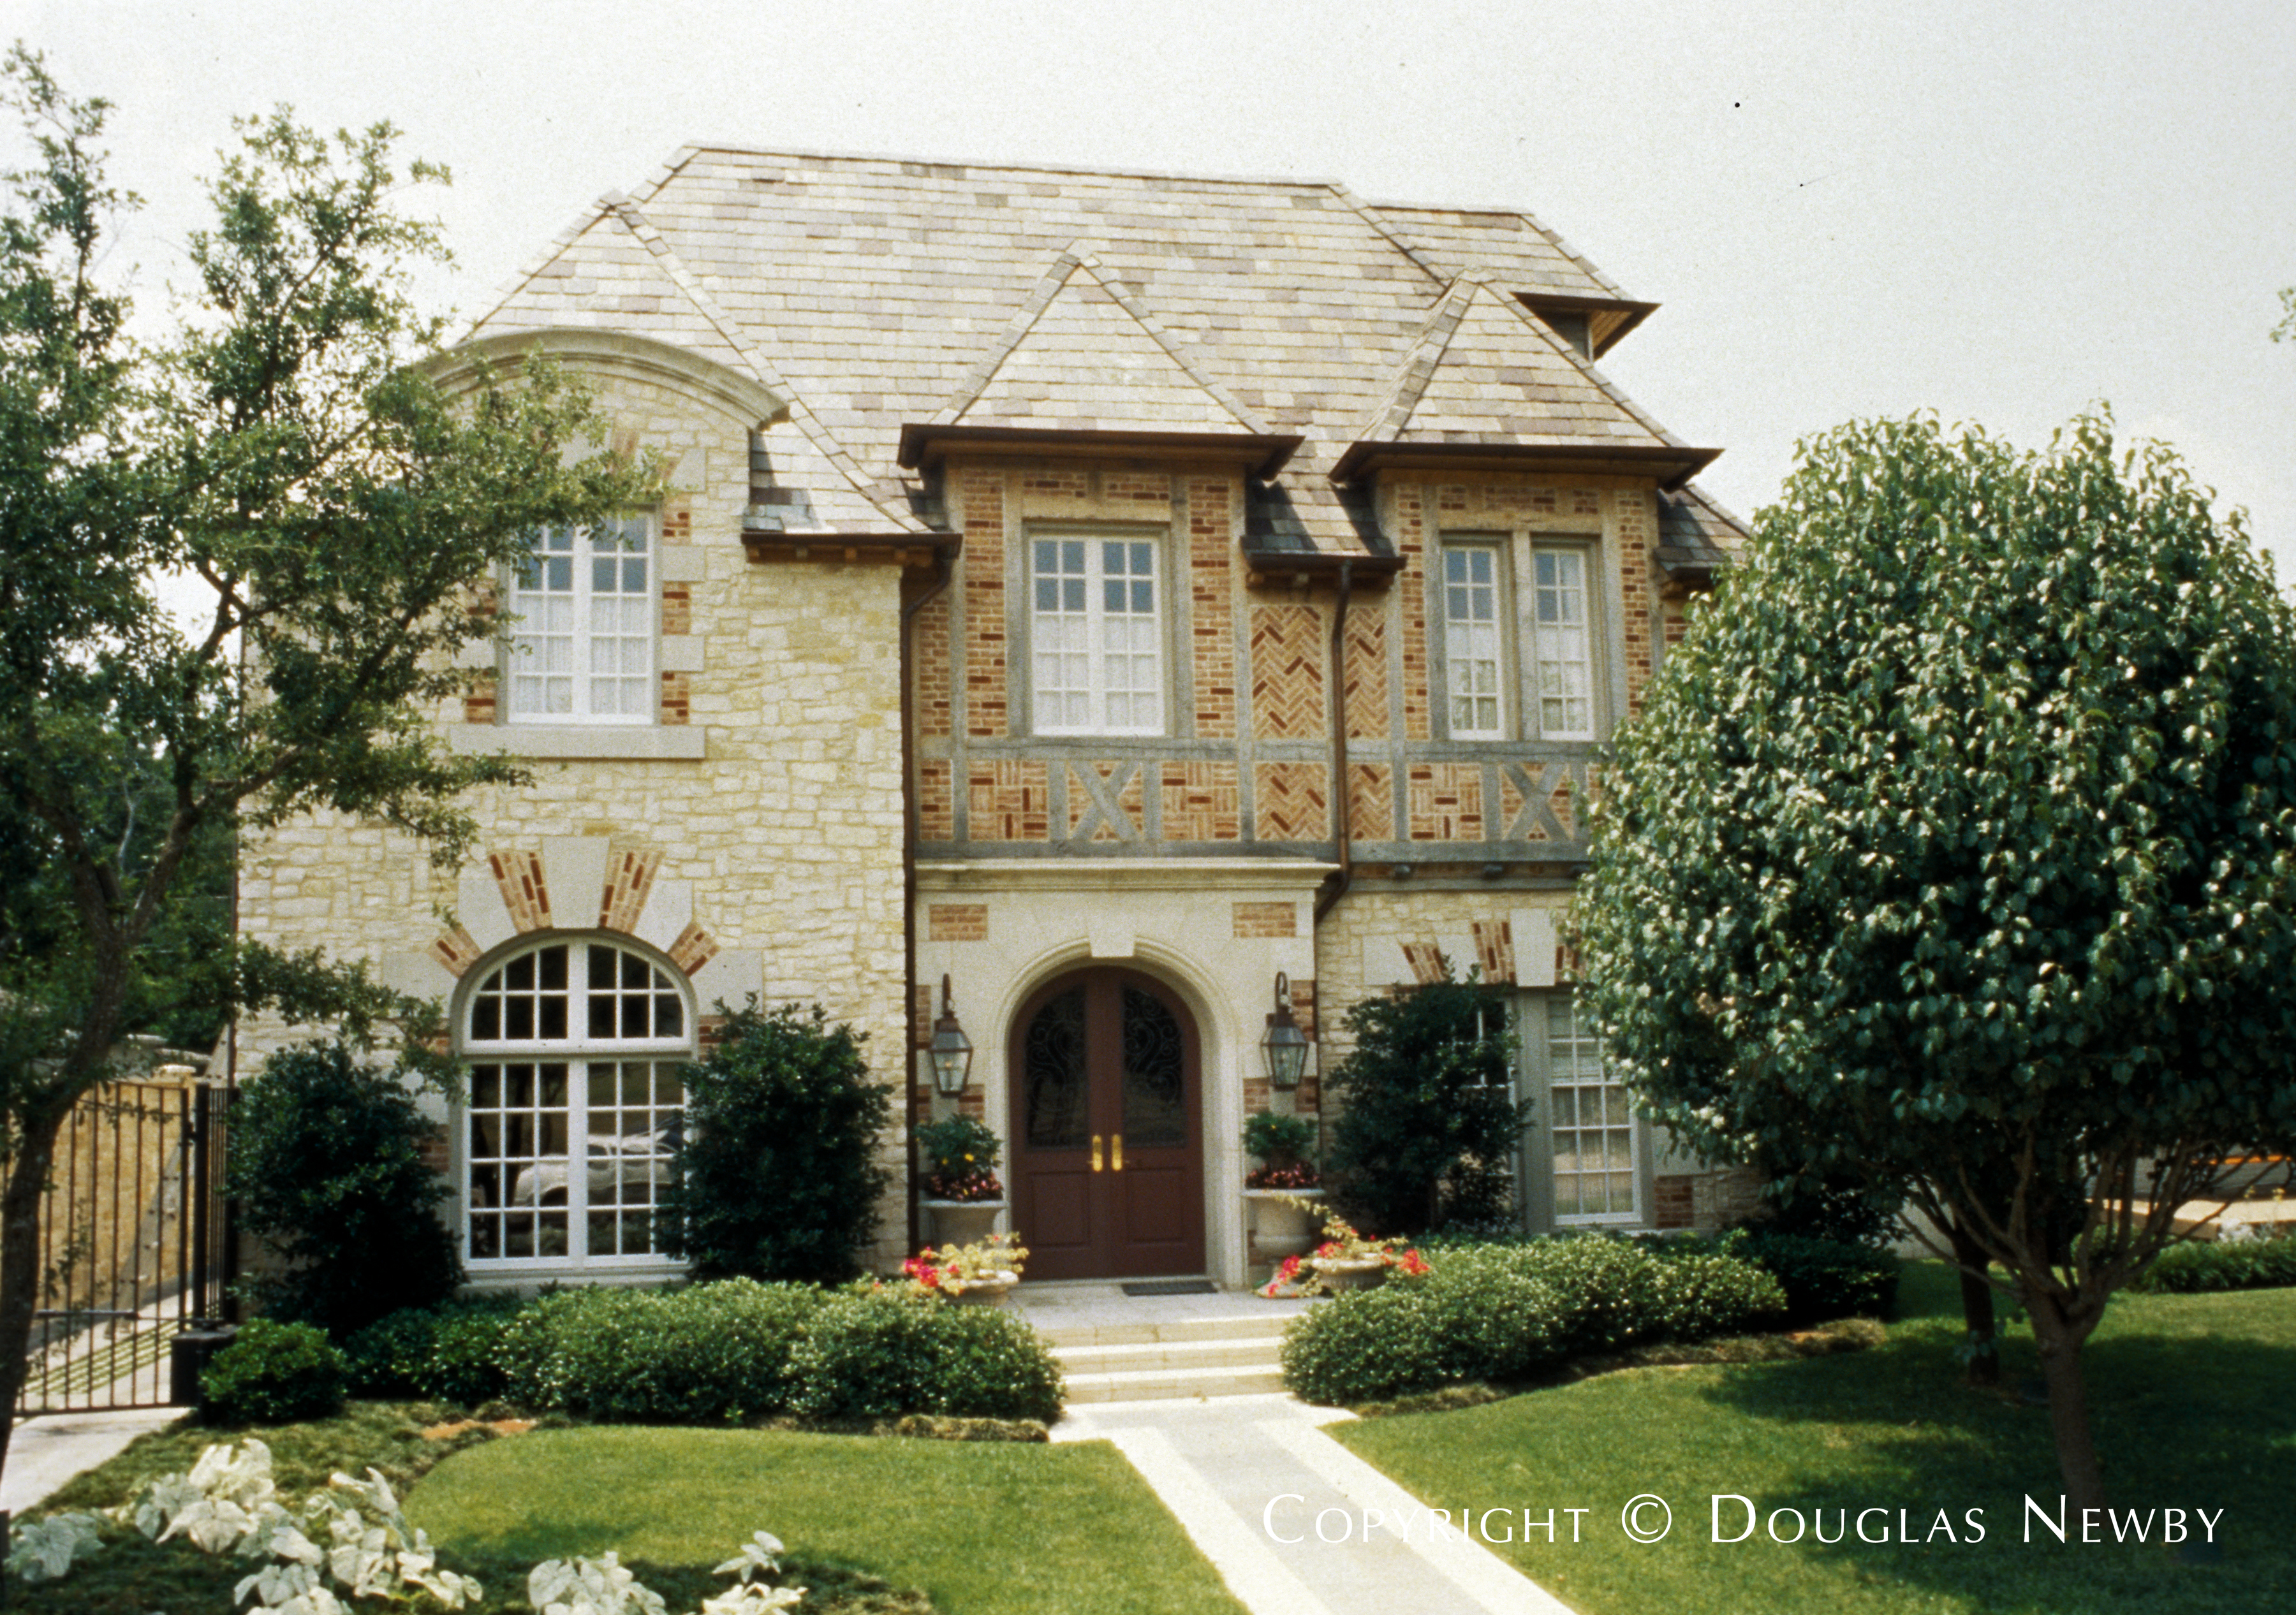 Architect Richard Drummond Davis Designed Normandy Home In Highland Park Neighborhood 4357 Southern Avenue Dallas Texas